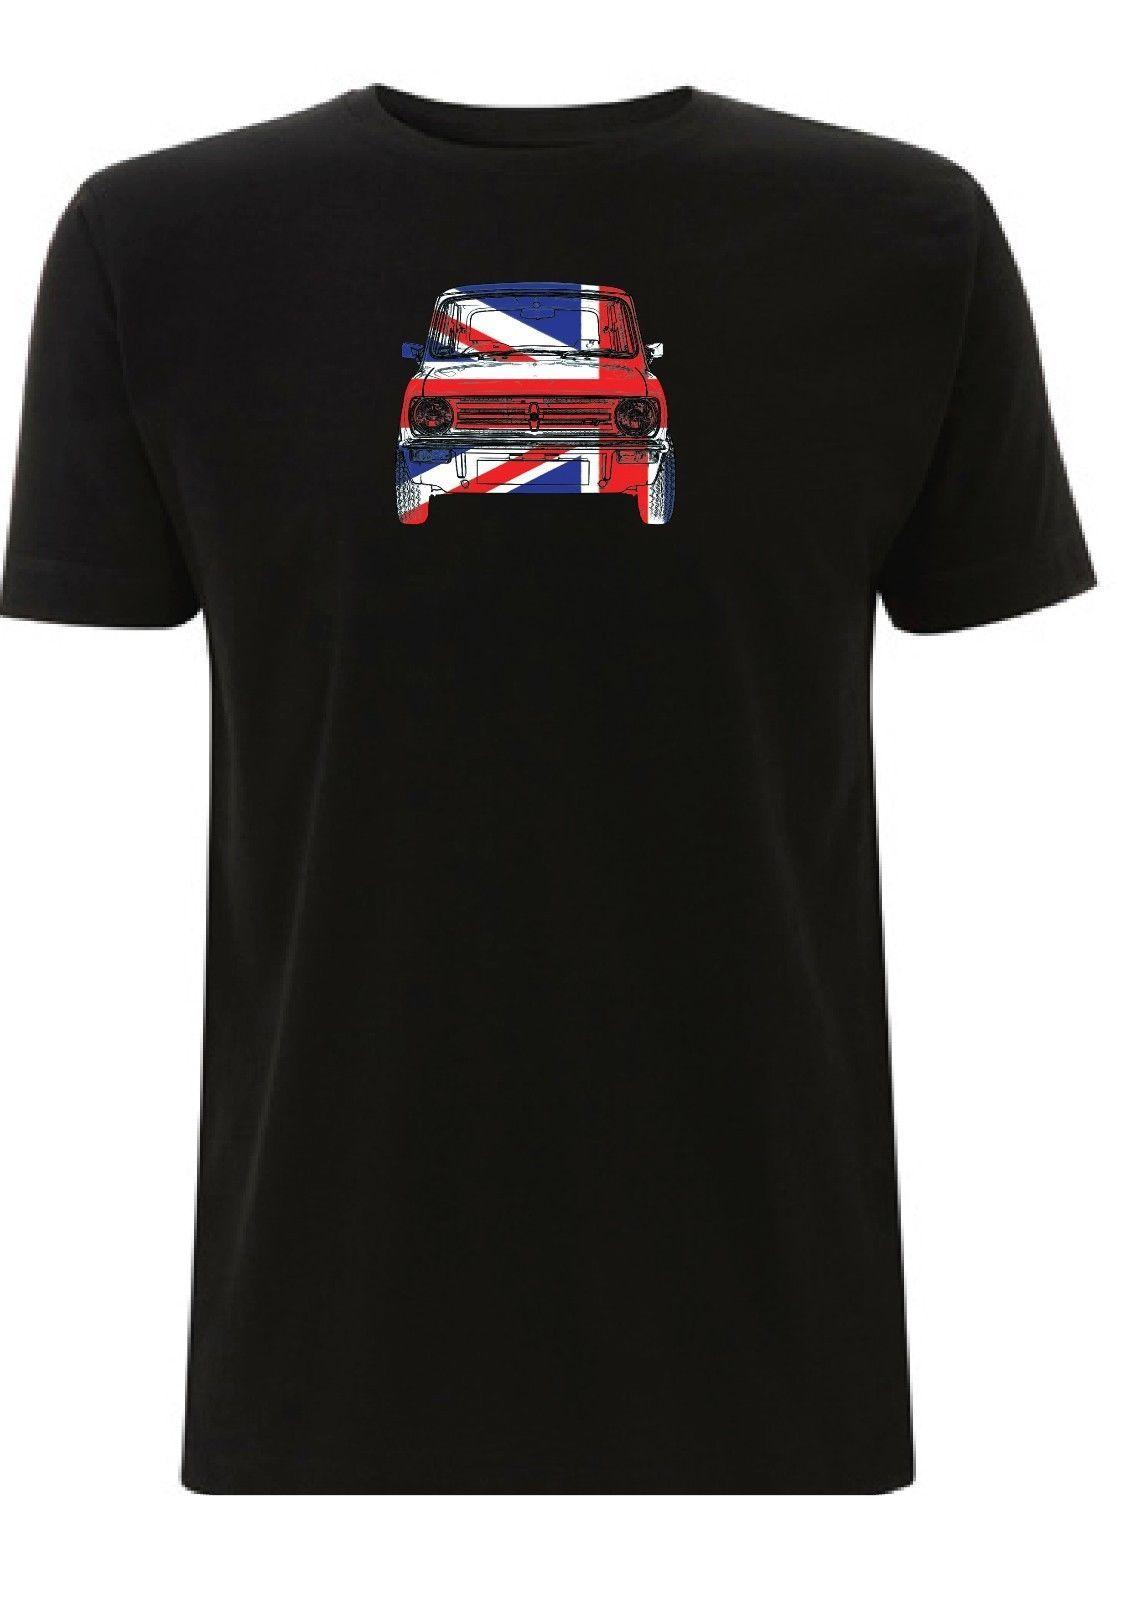 1275 Gt Mini Clubman T Shirt Union Jack British Leyland Cooper